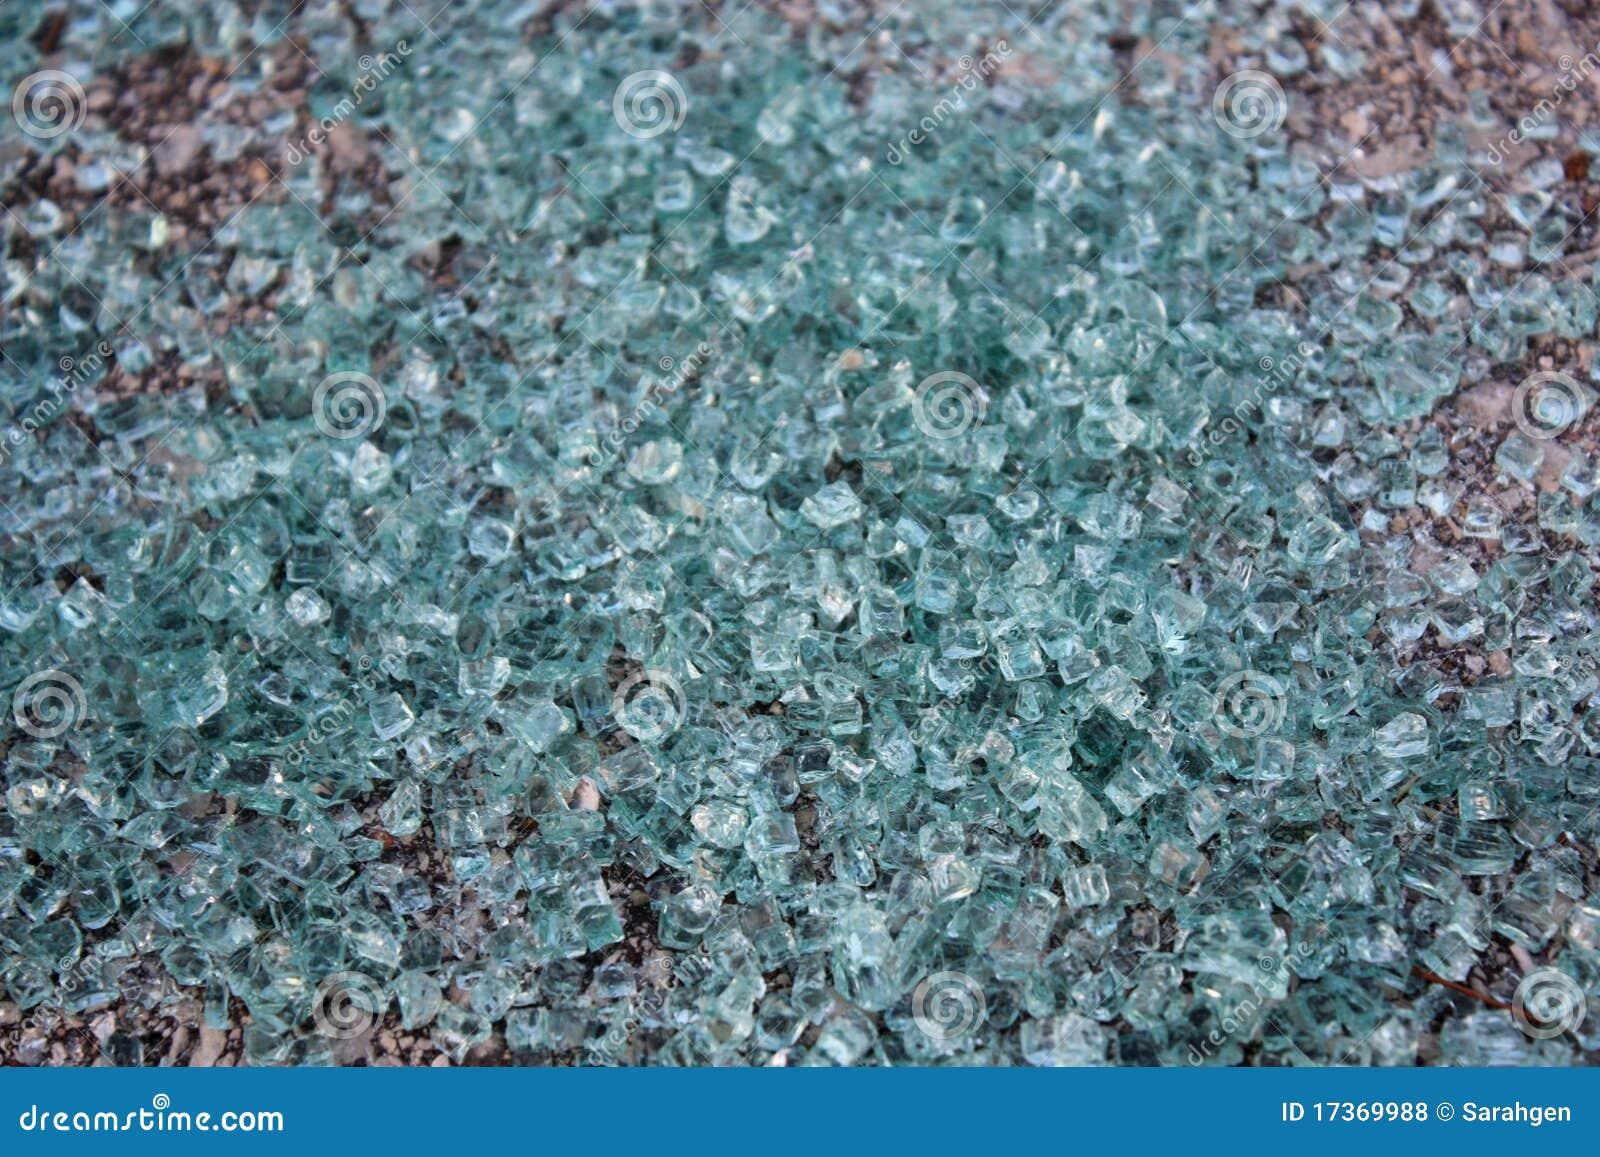 Broken Auto Glass Stock Photo Image Of Robbery Broken